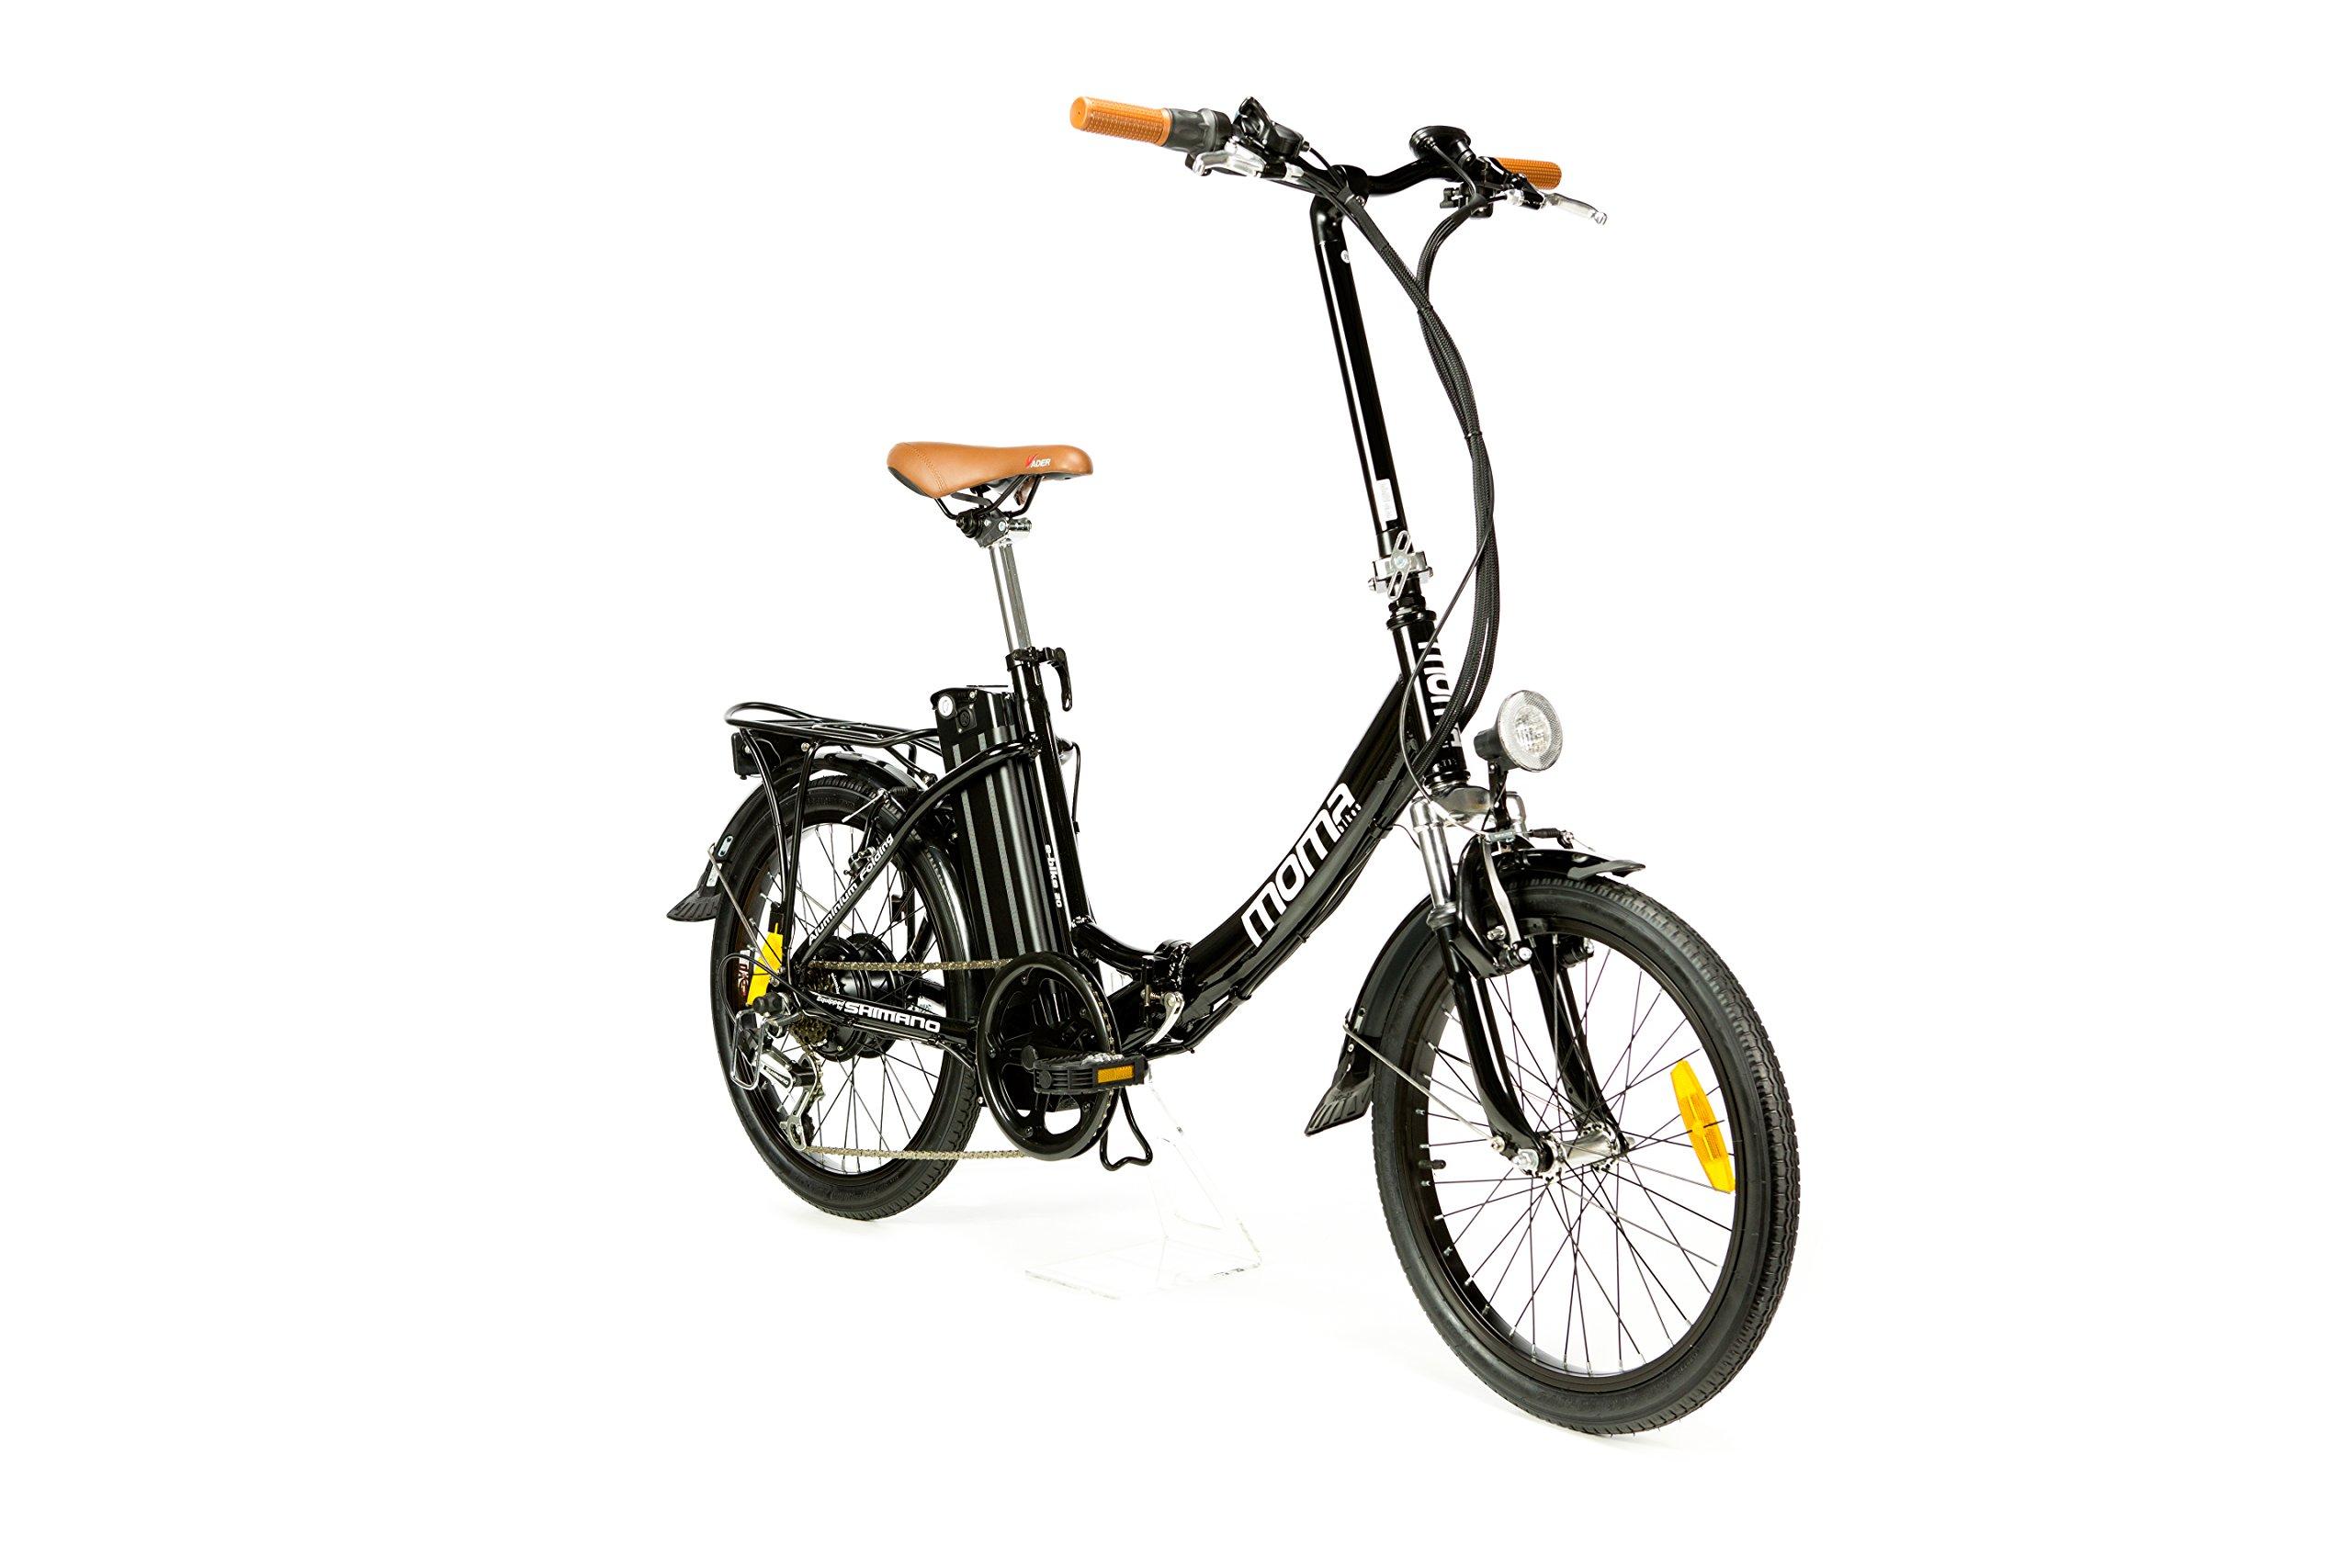 "Moma Bikes Vélo Electrique VAE Pliant De ville, E-20"", Aluminium, SHIMANO 7V, Bat. Ion Lithium 36V 16Ah product image"